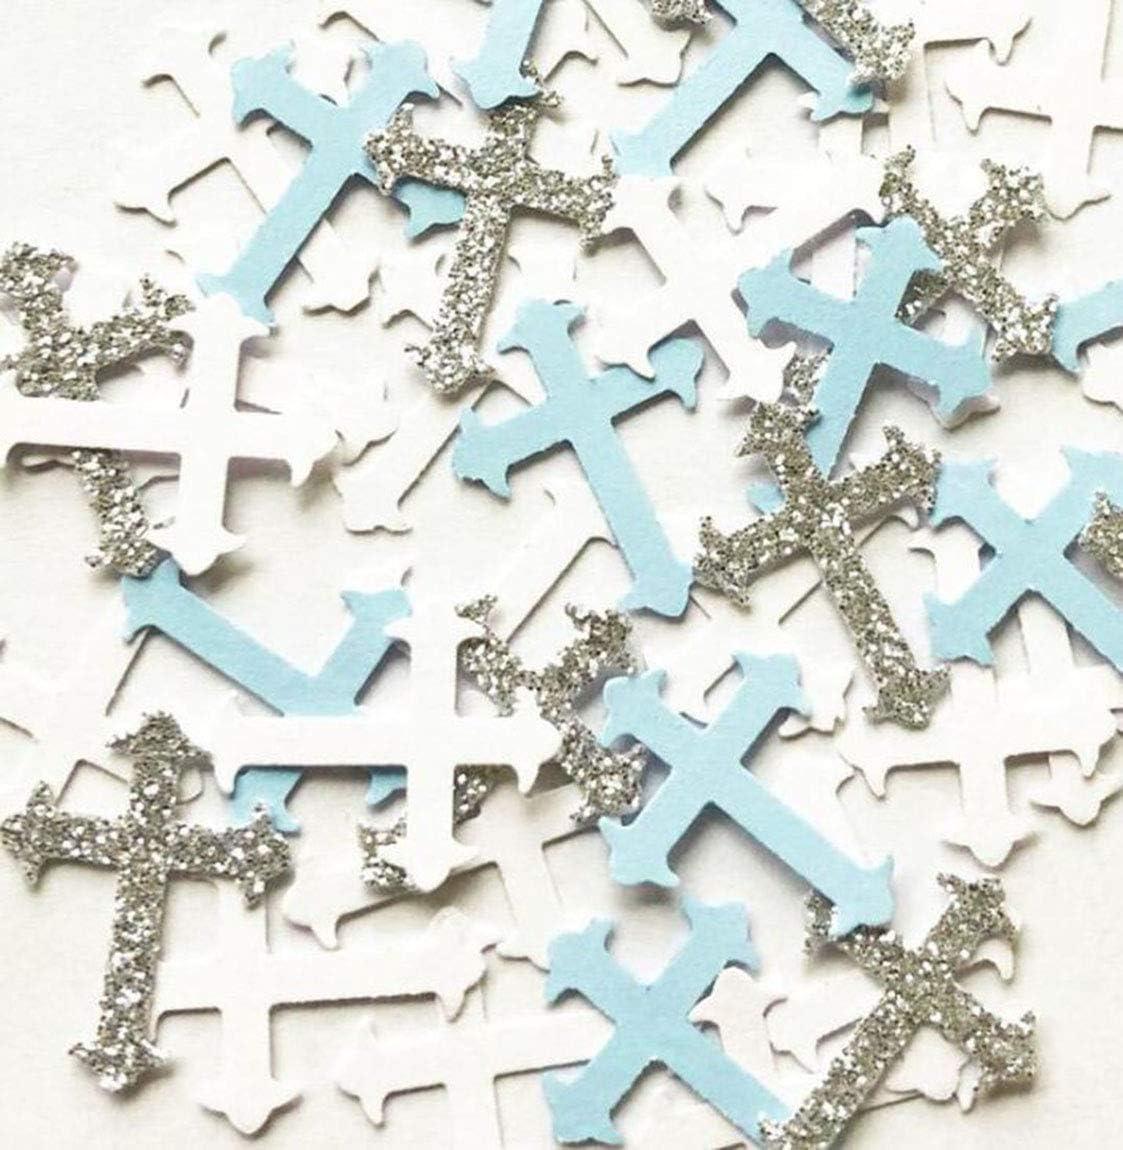 100Pieces 2.5inche Baby Blue Silver White Glitter Cross Confetti,Religious Party Confetti,Cross Table Confetti,Religion, Festival, Wedding, Engagement Baby Shower, Boy Baptism, Birthday Party Decor